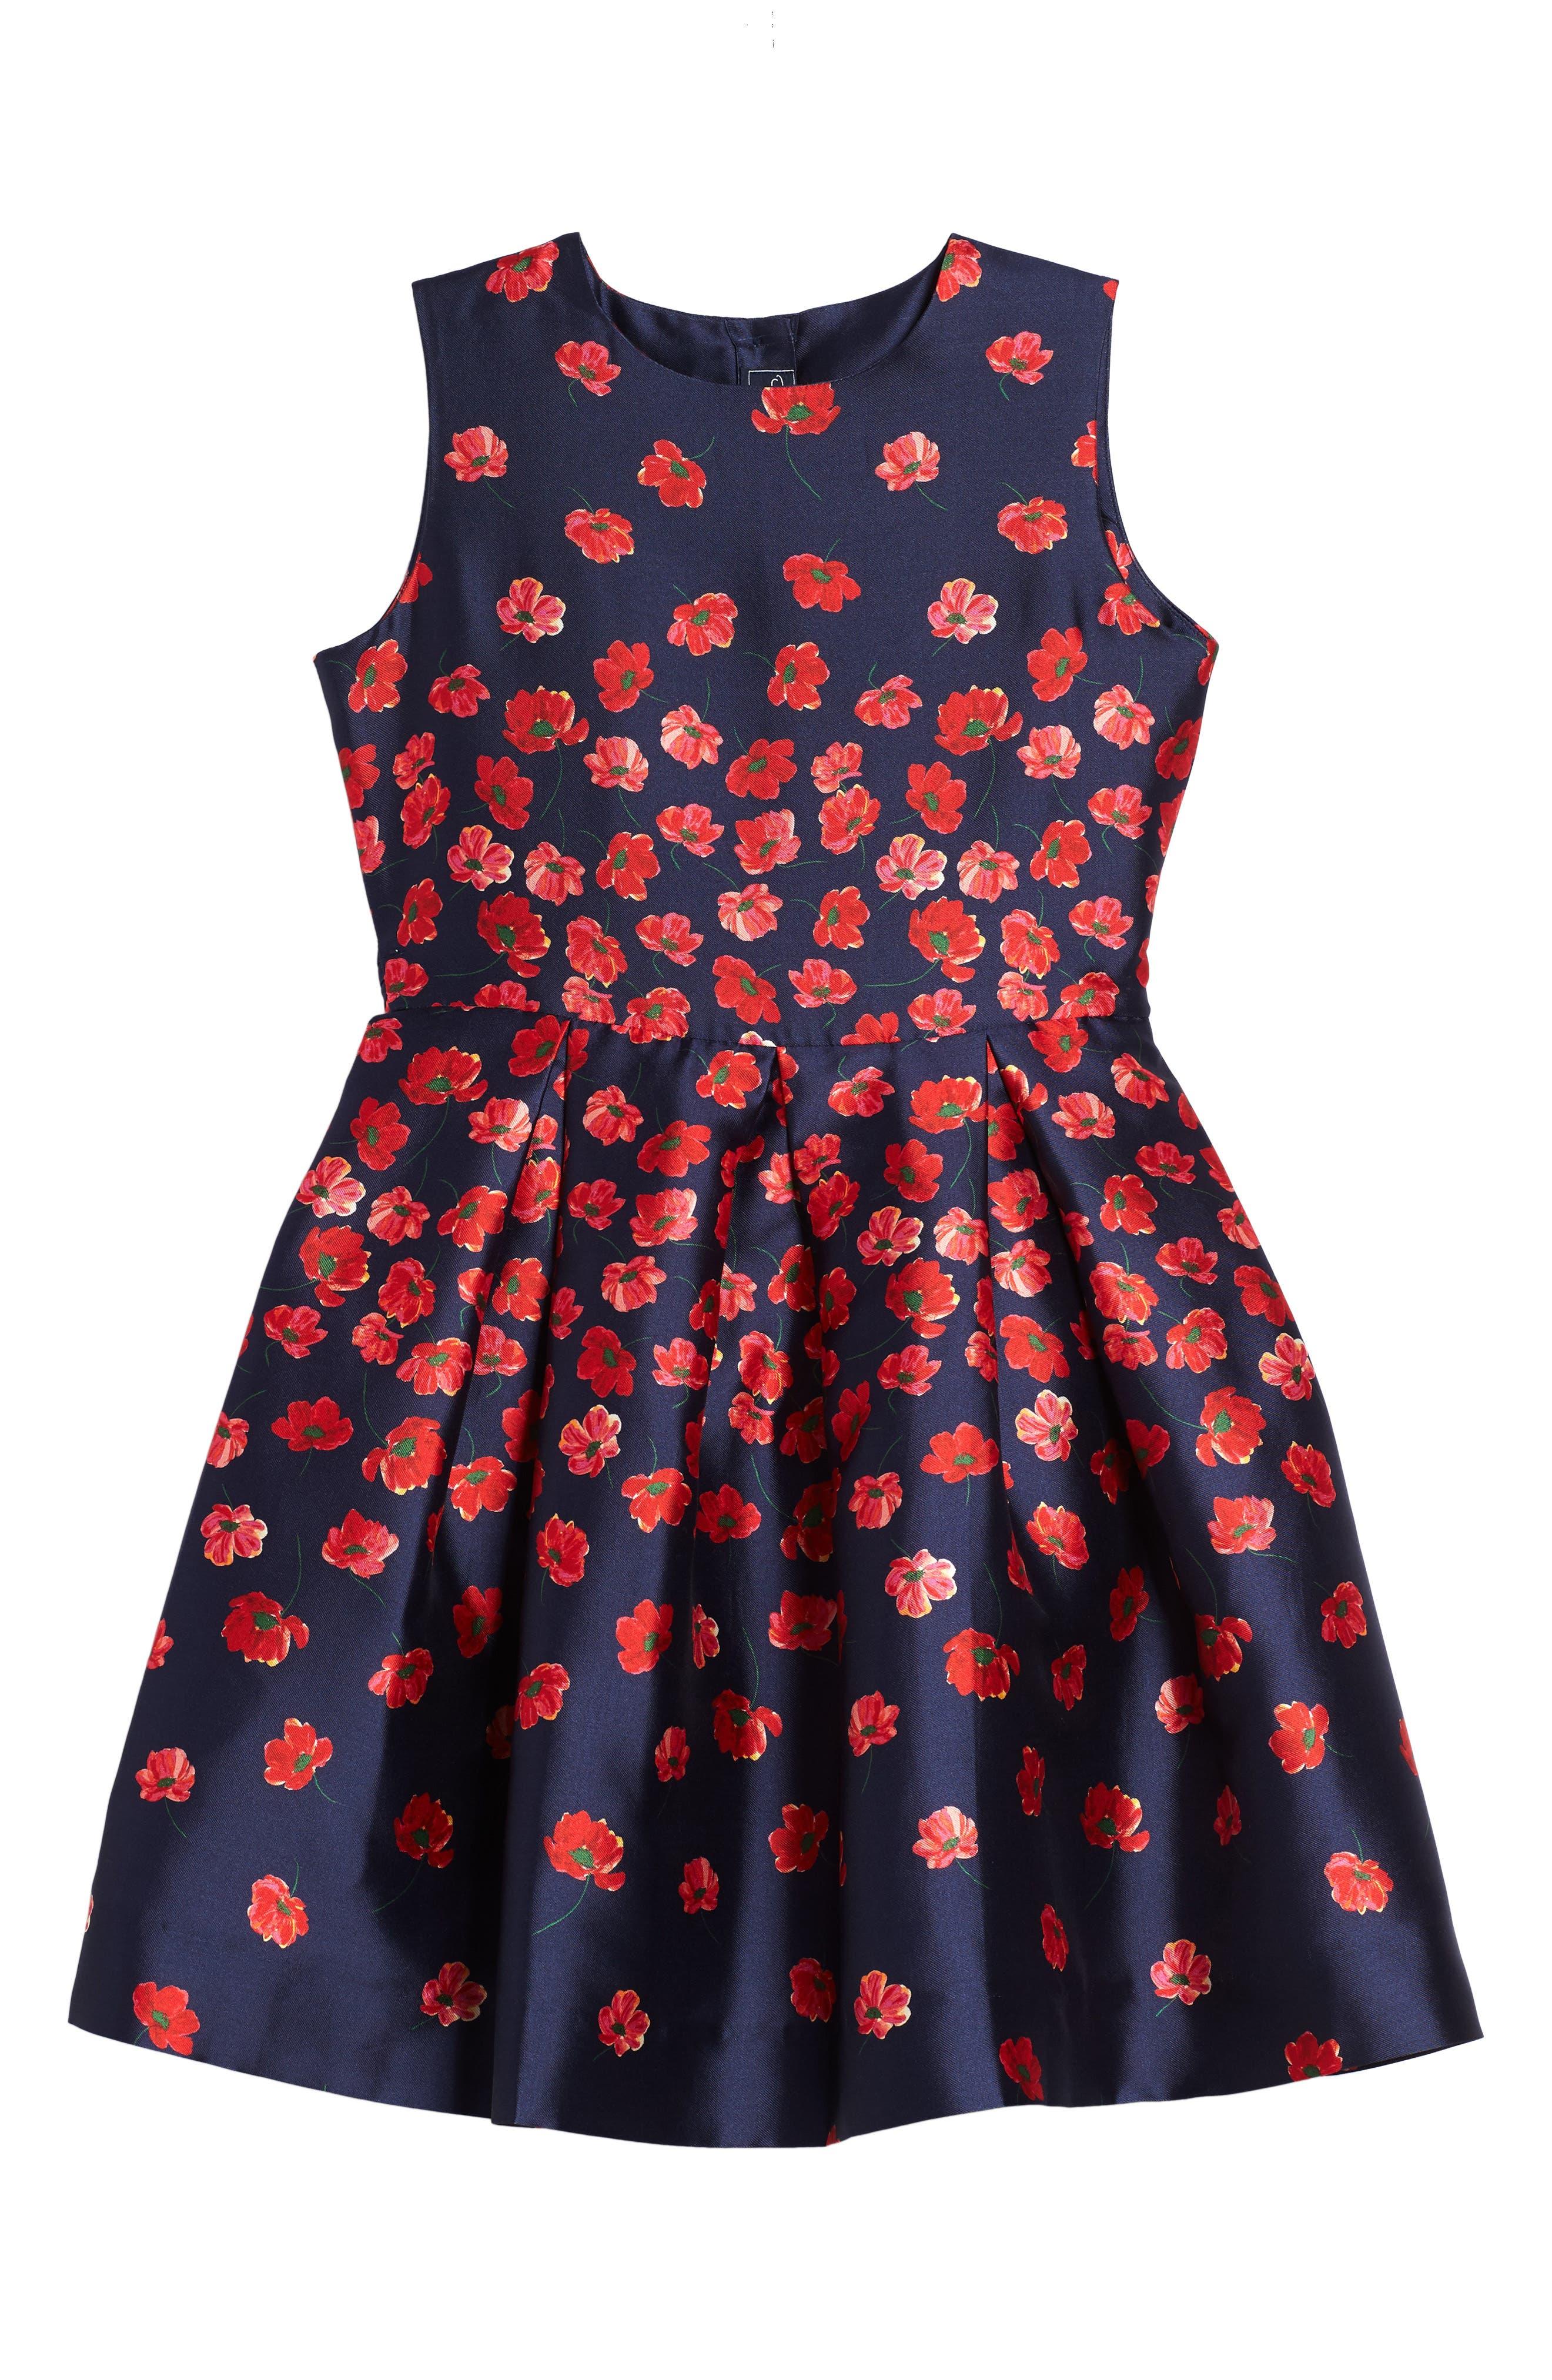 Oscar de la Renta Poppies Mikado Party Dress (Toddler Girls, Little Girls & Big Girls)